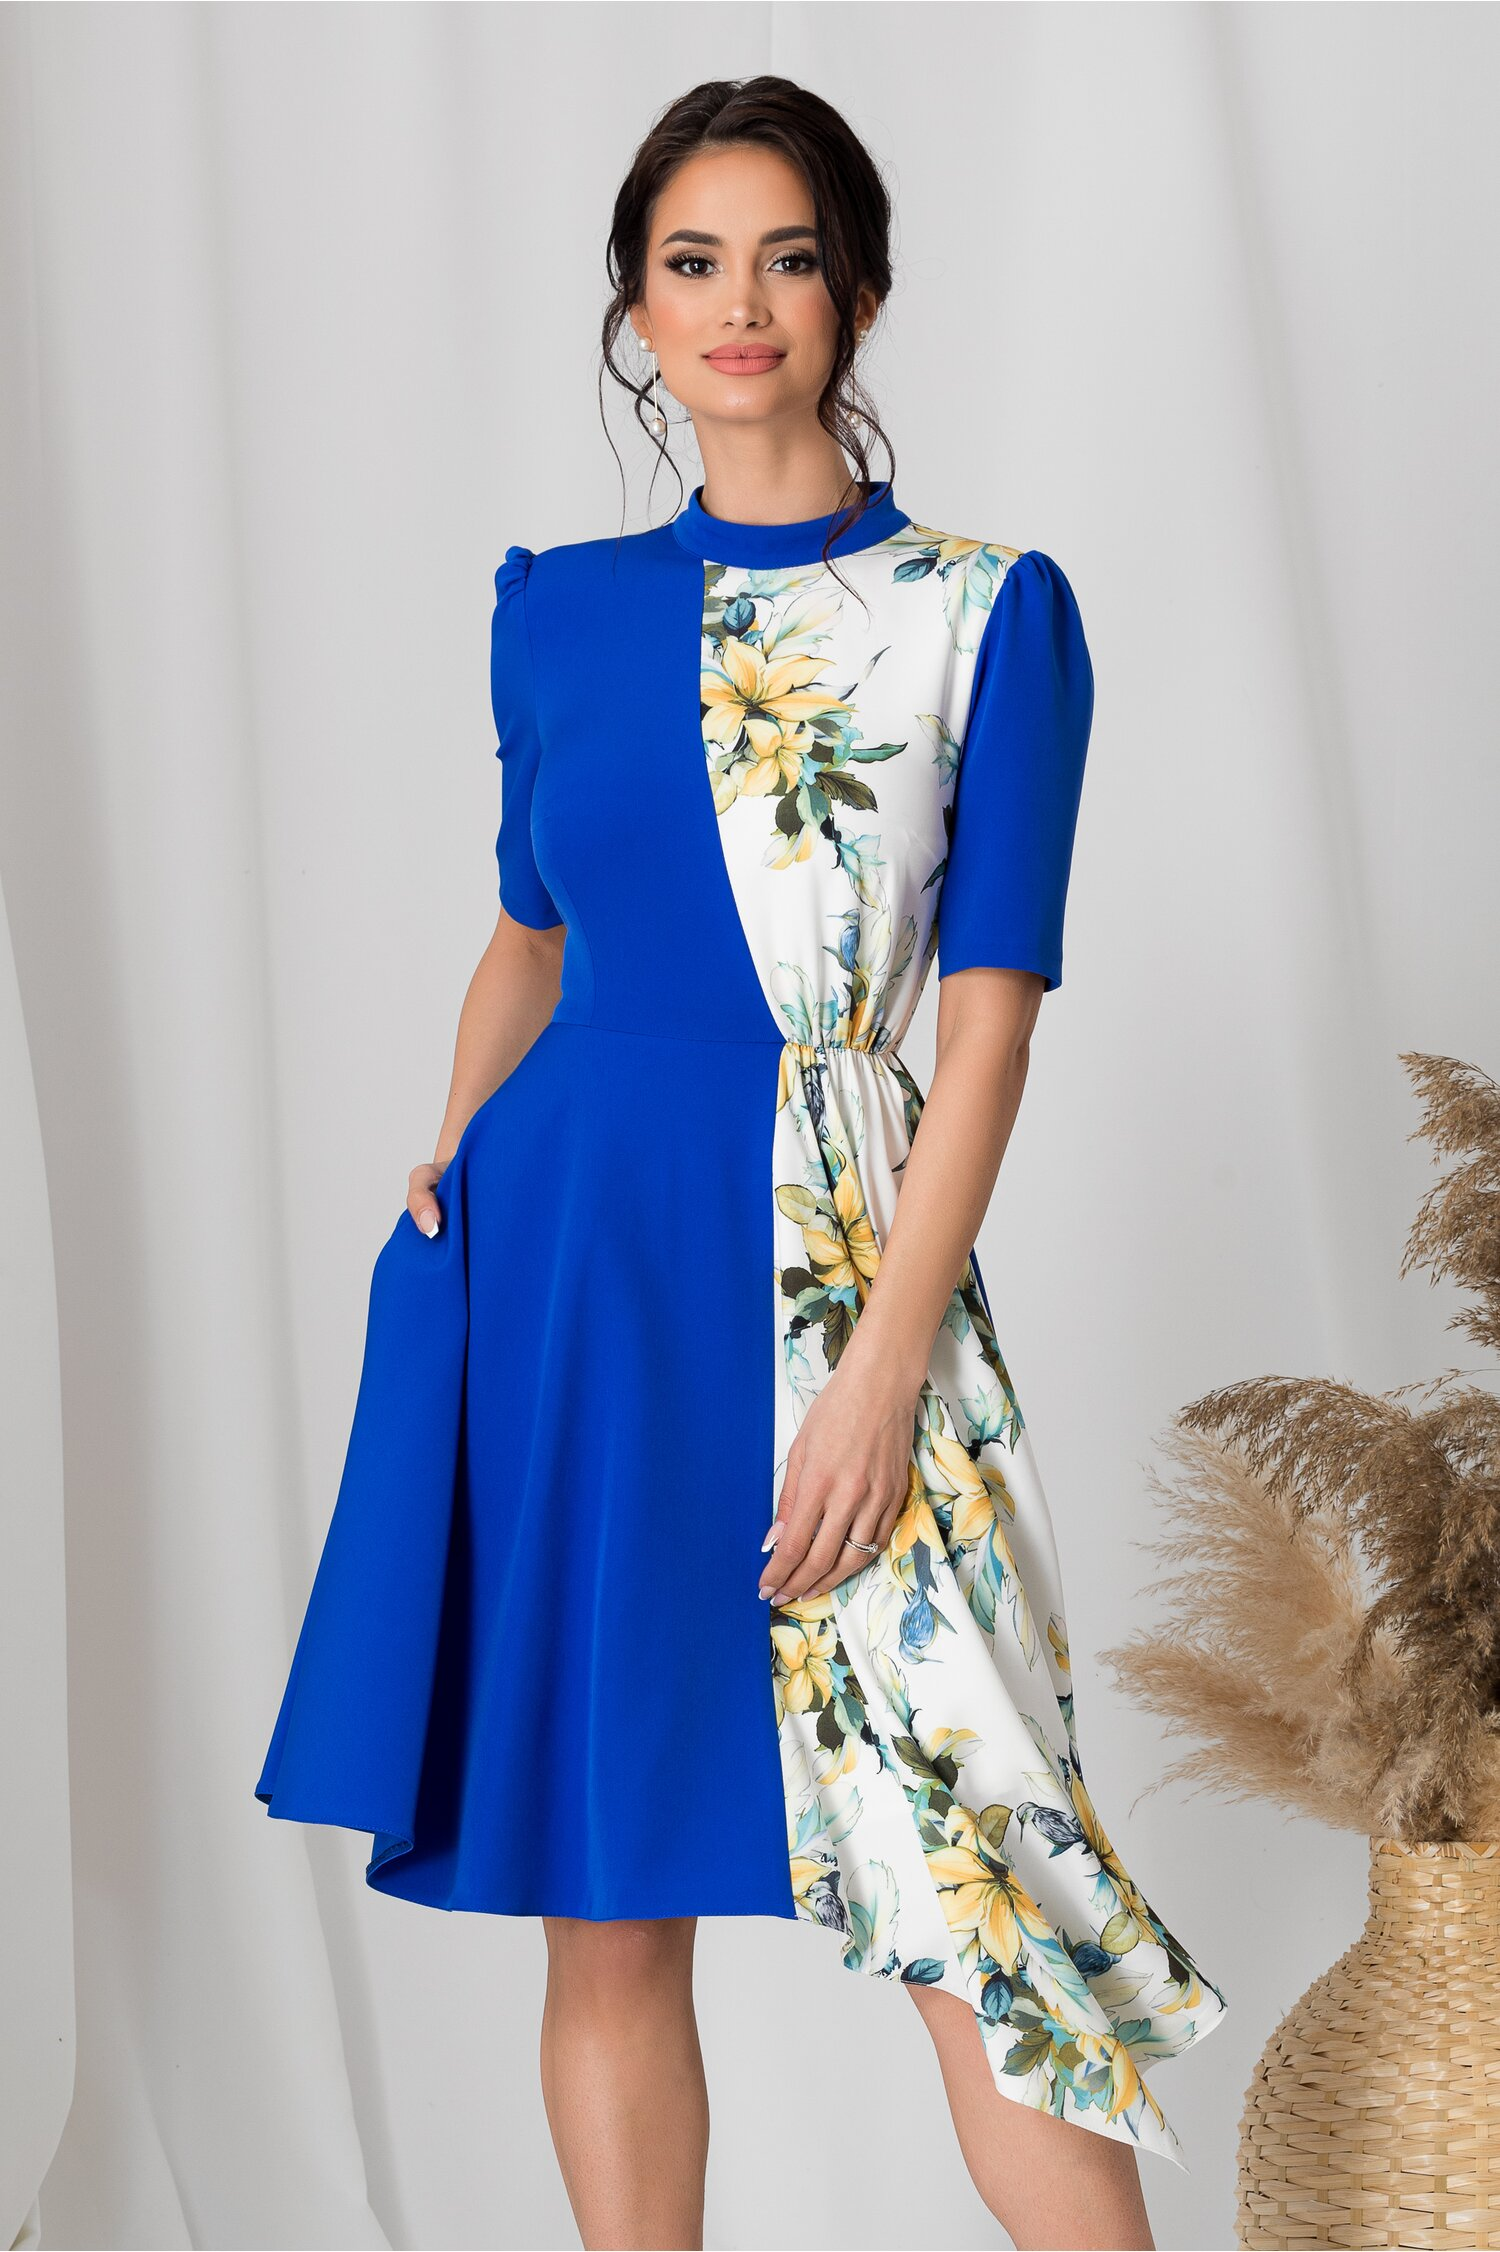 Rochie MBG duo albastru electric si imprimeu floral pe fundal alb imagine dyfashion.ro 2021